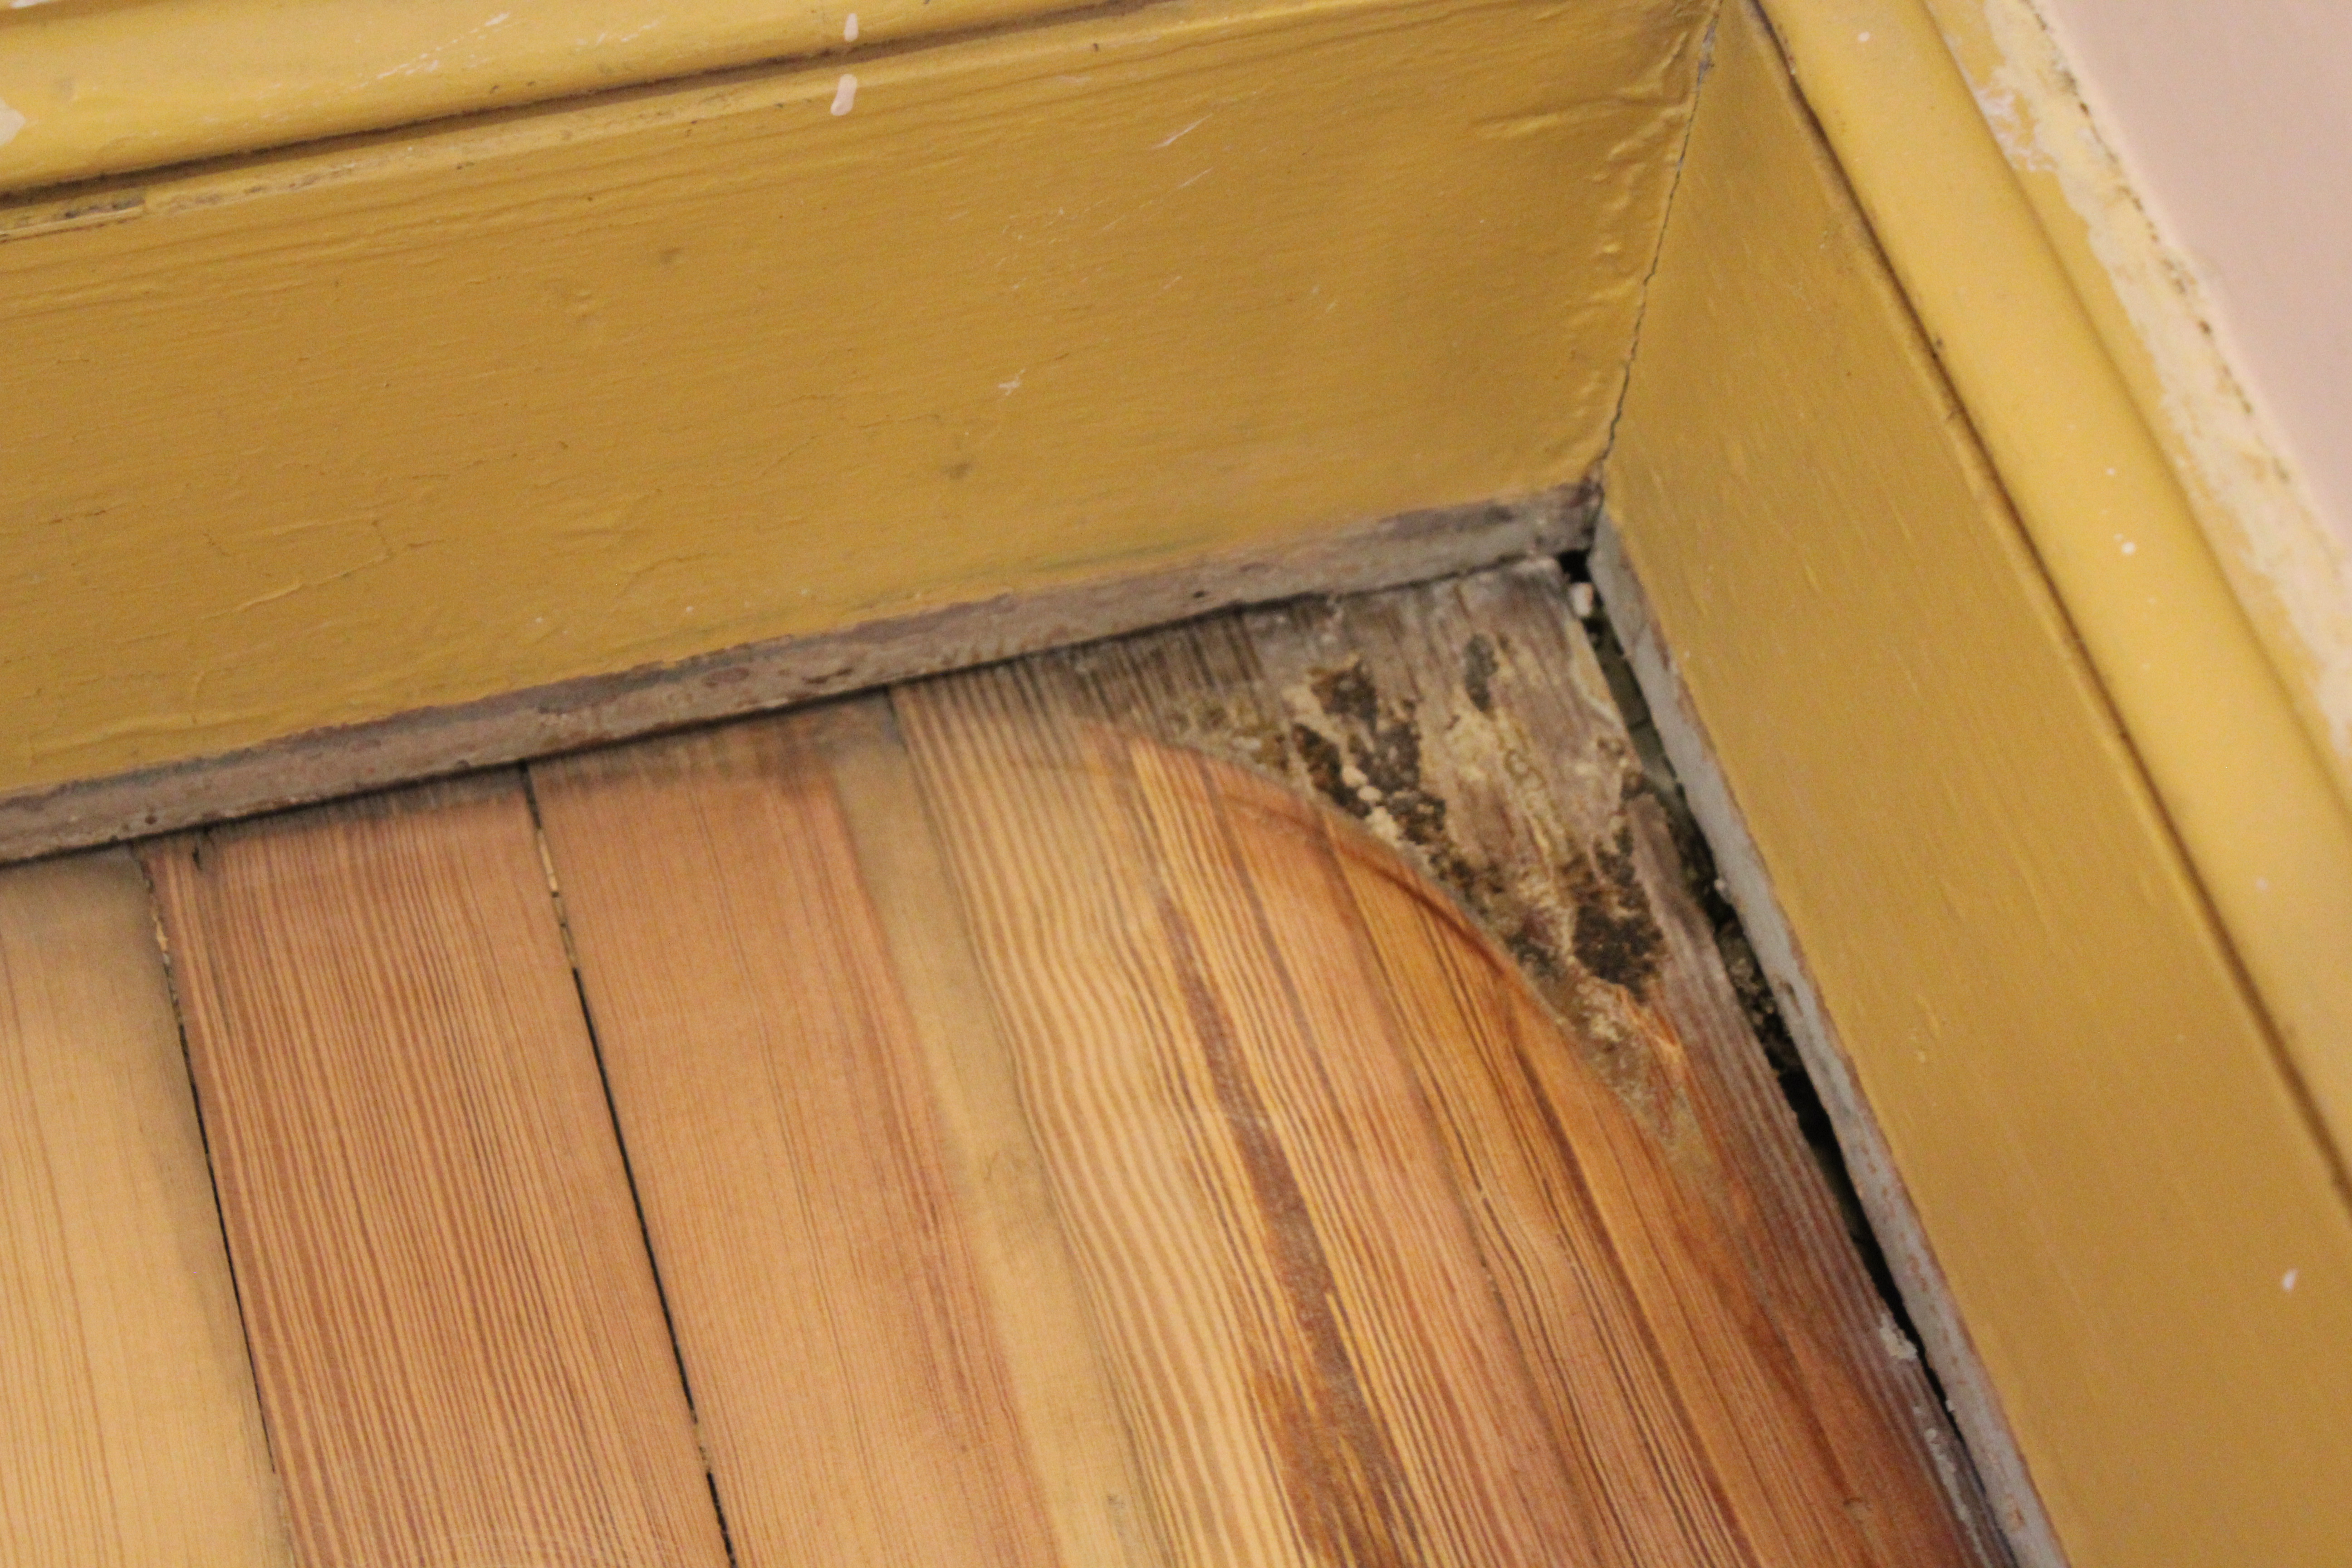 12 Fantastic Cost To Refinish Hardwood Floors Calculator